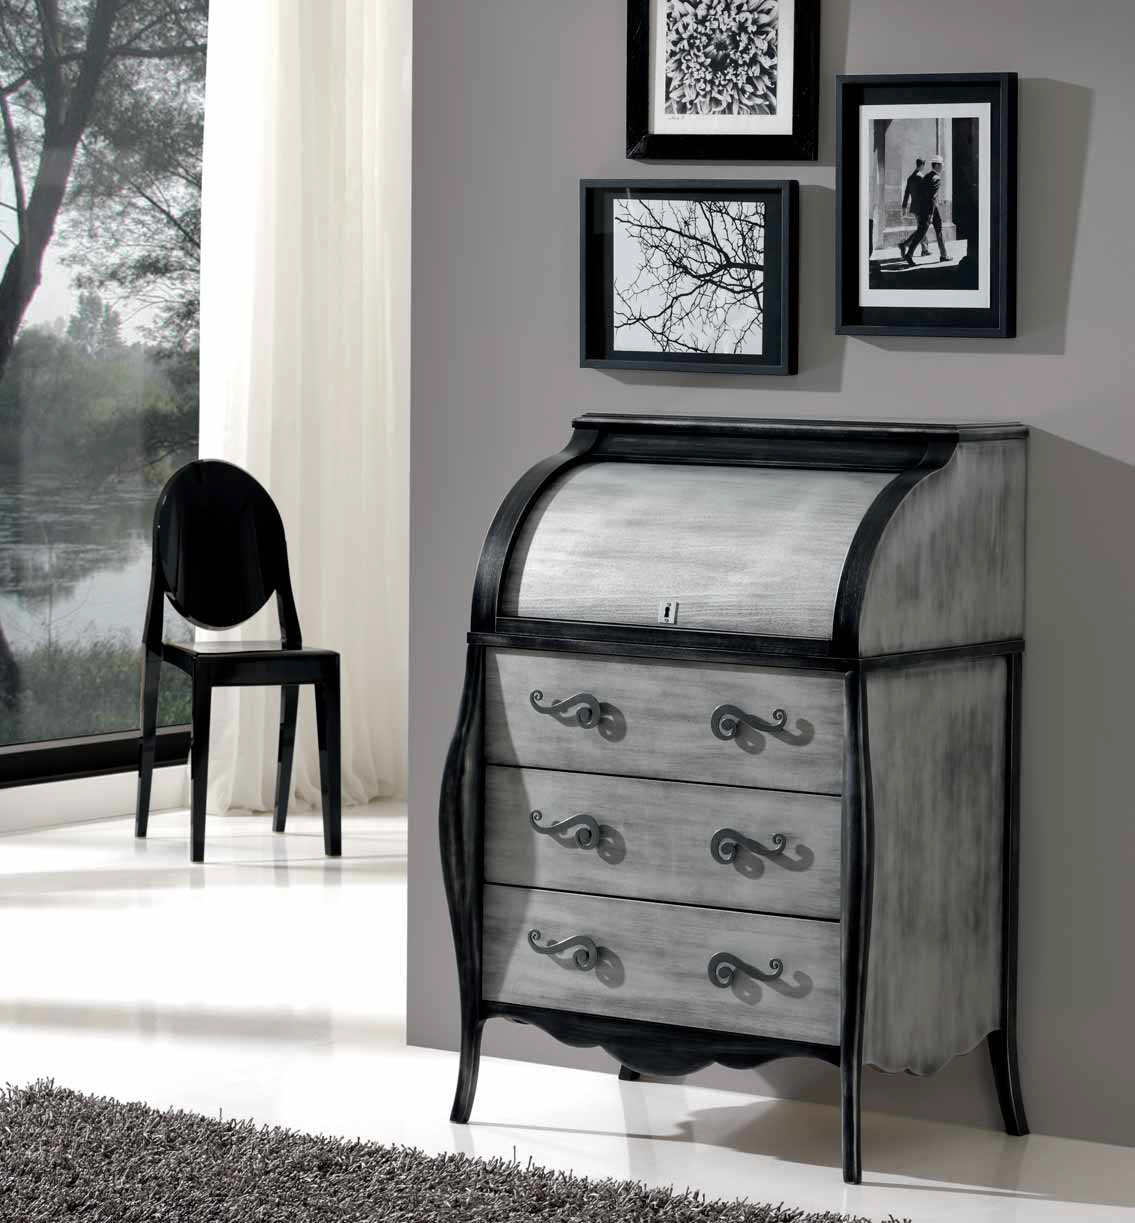 Bur escritorio valmojado muebles d azmuebles d az for Muebles diaz